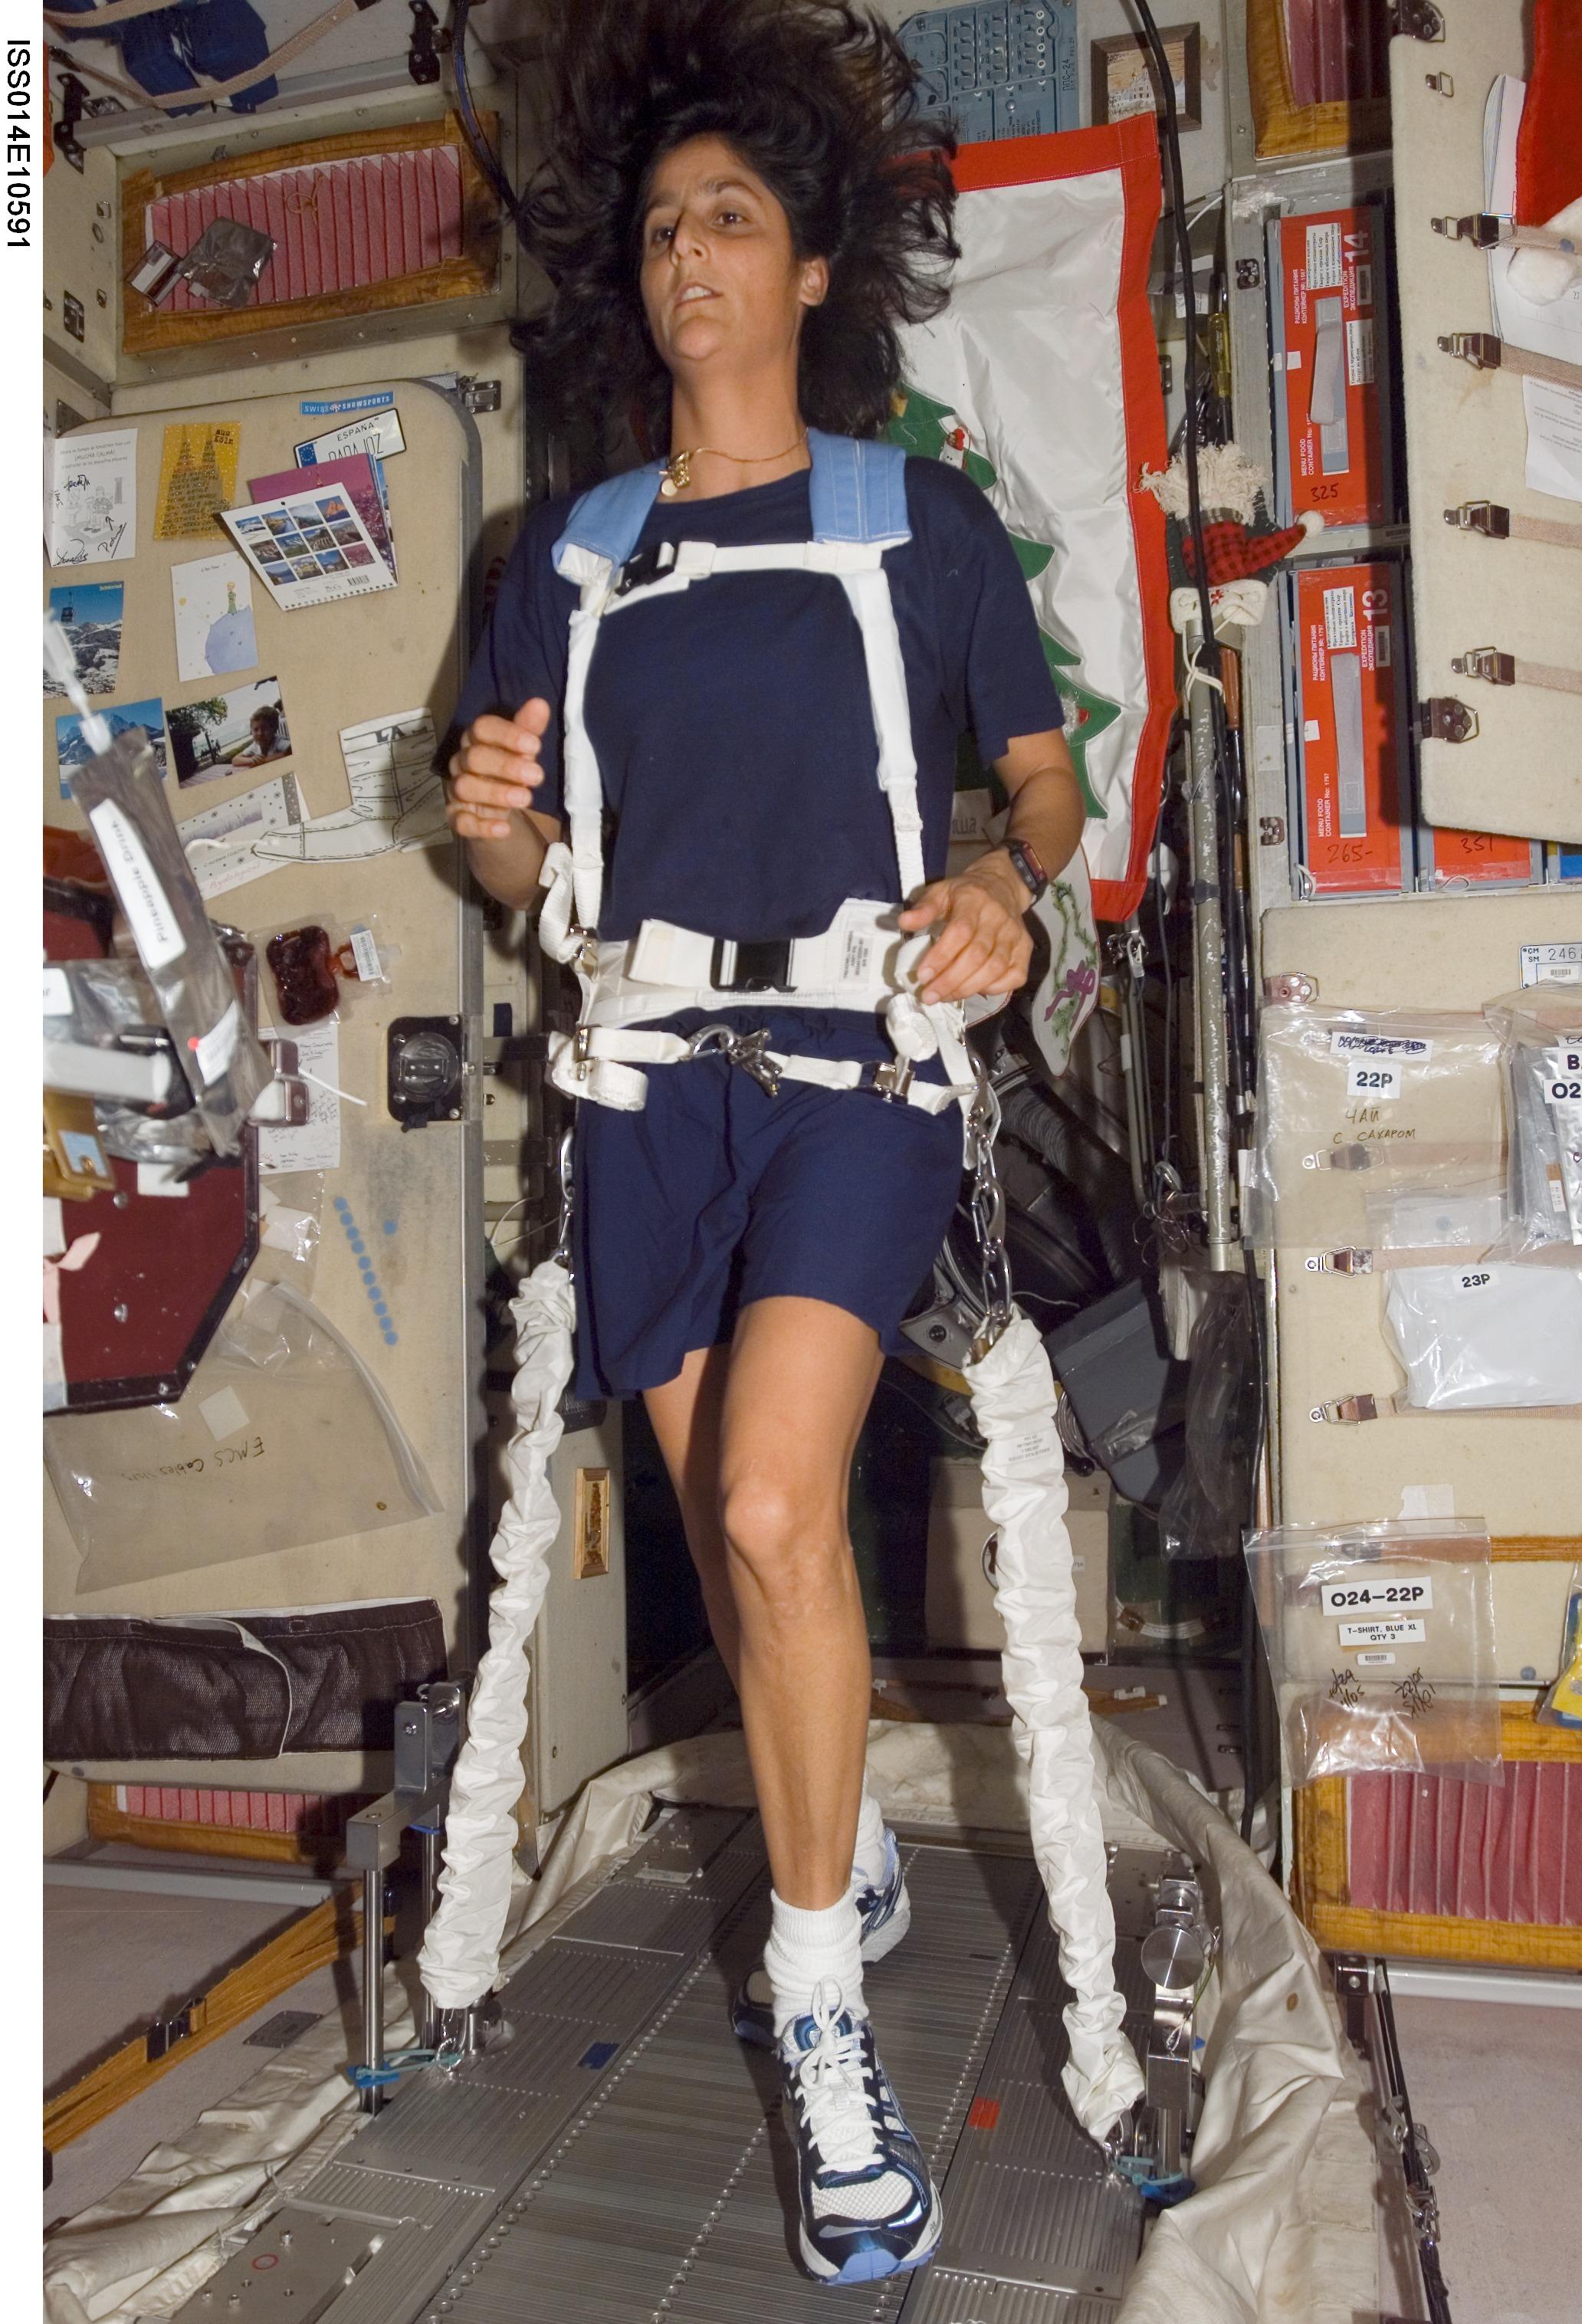 NASA - COLBERT Ready for Serious Exercise